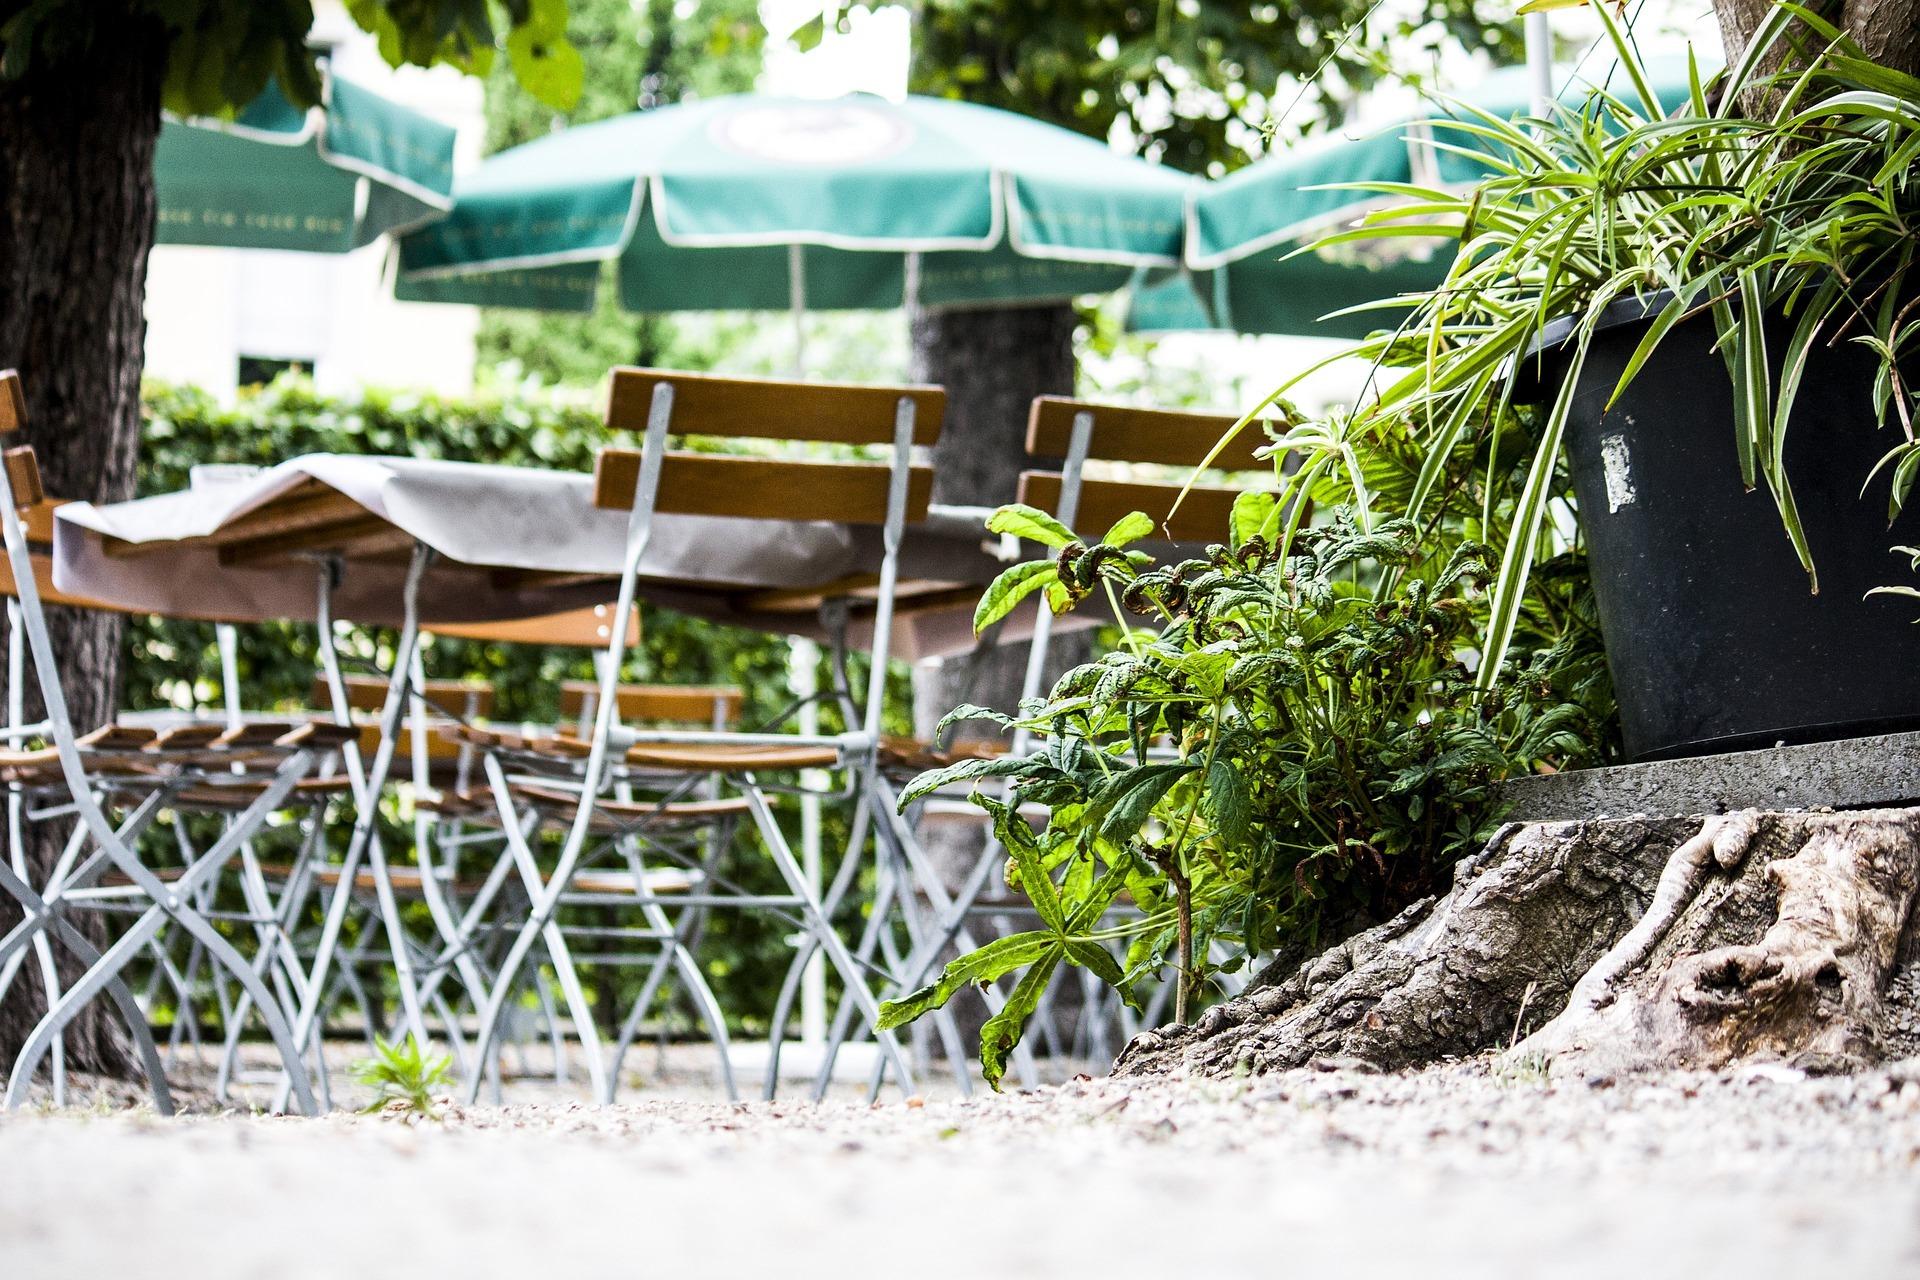 Sommersaisonfinale in EDDI>S KELLEREI Gartenrestaurant!